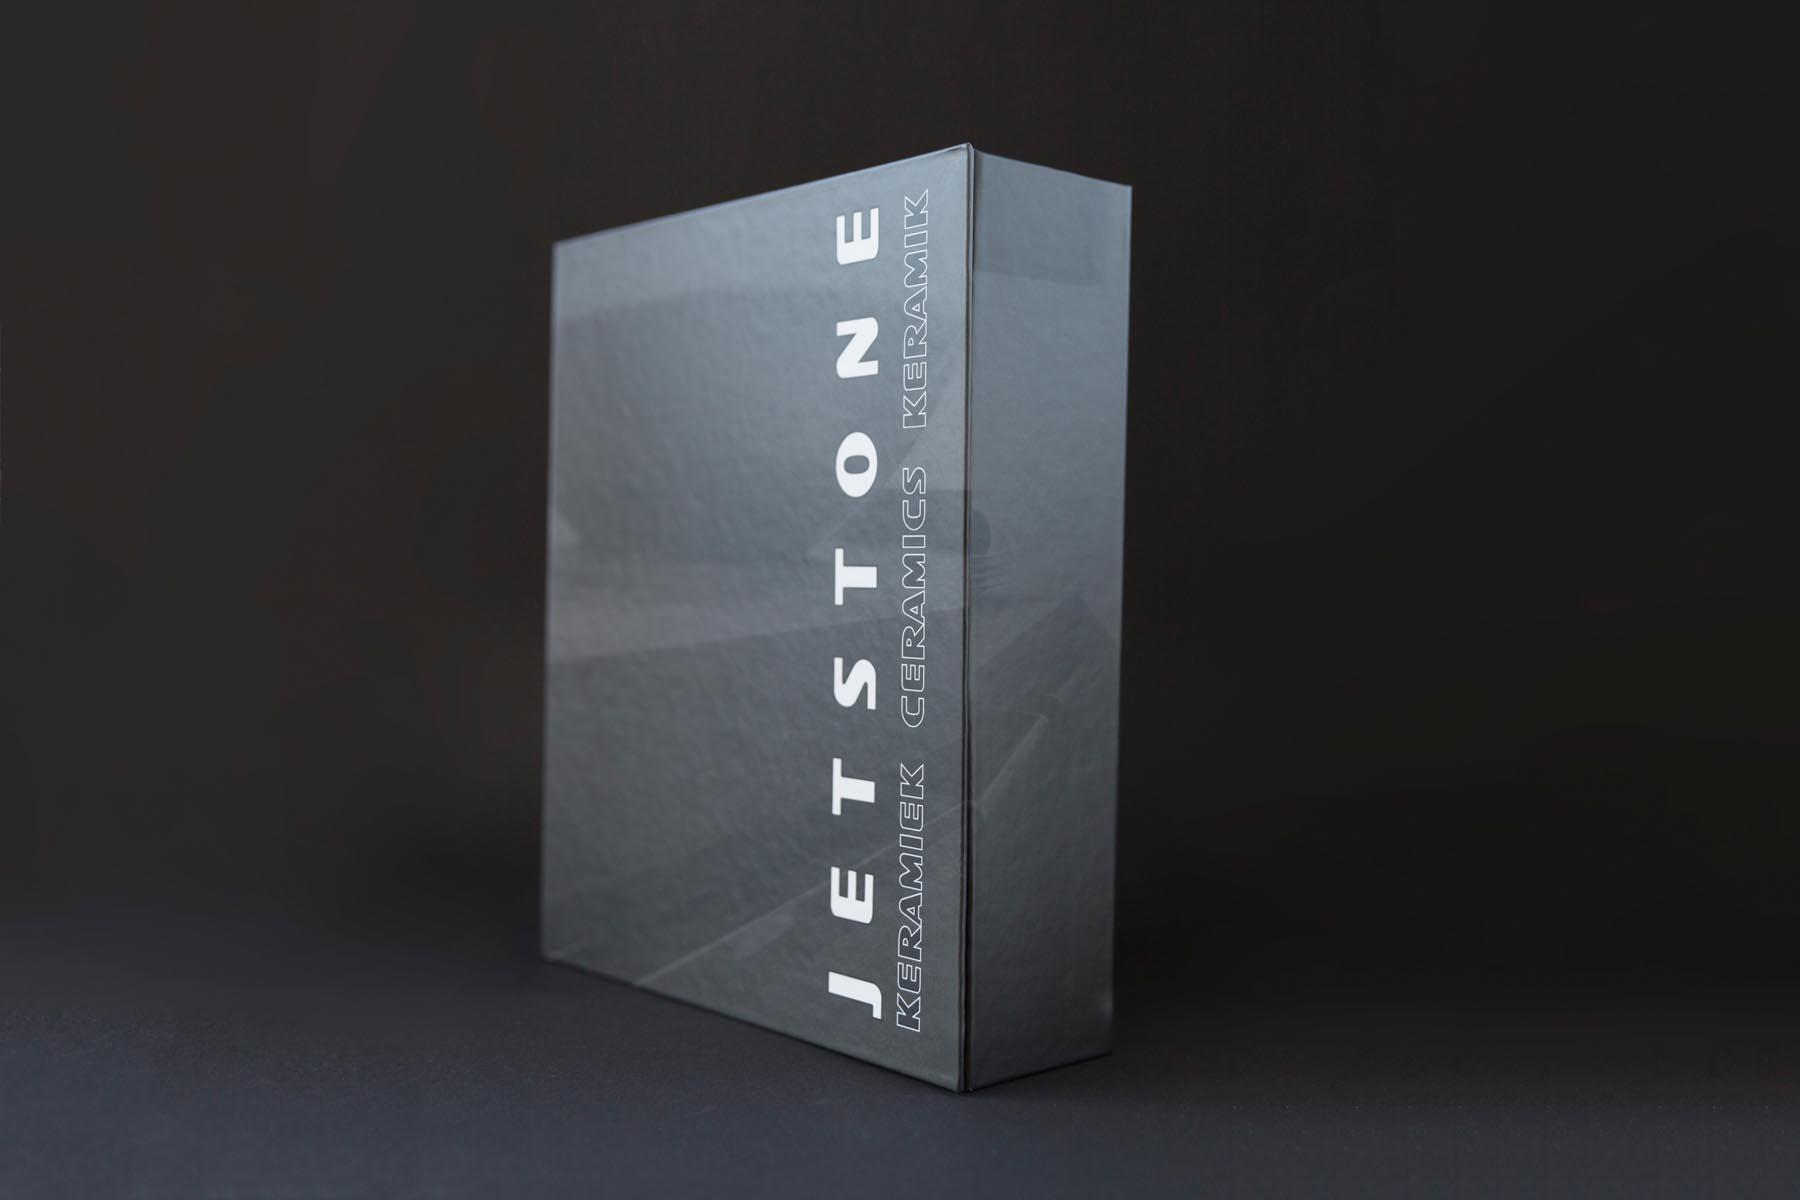 Magneetband Jetstone